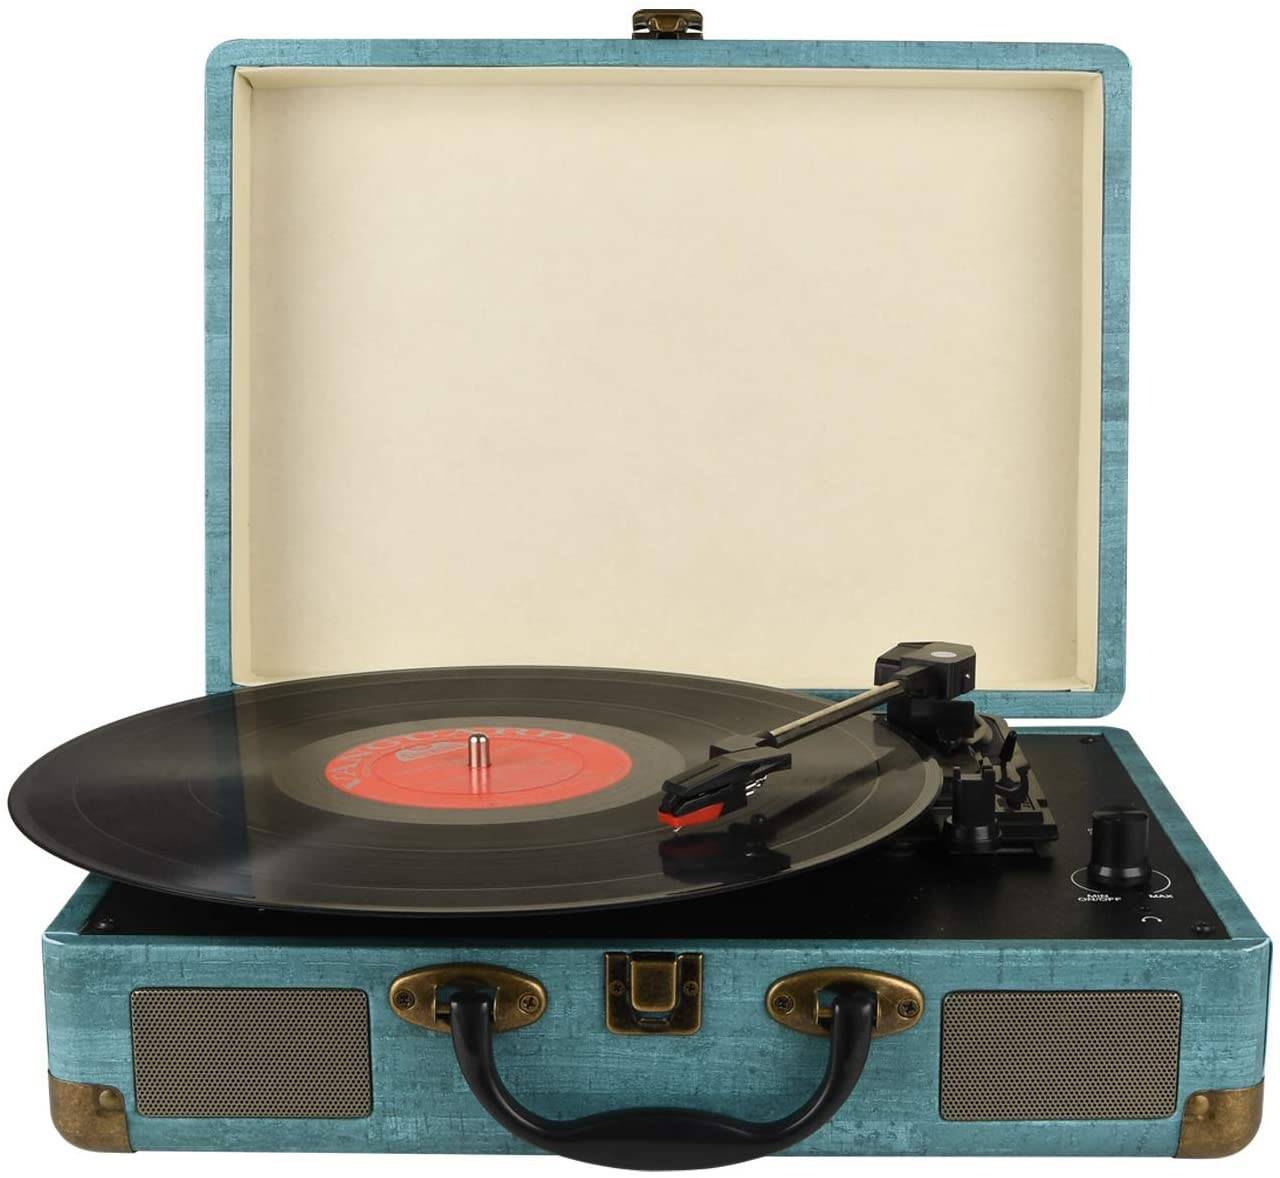 Kedok Vintage Bluetooth Record Player - Stereo Speaker